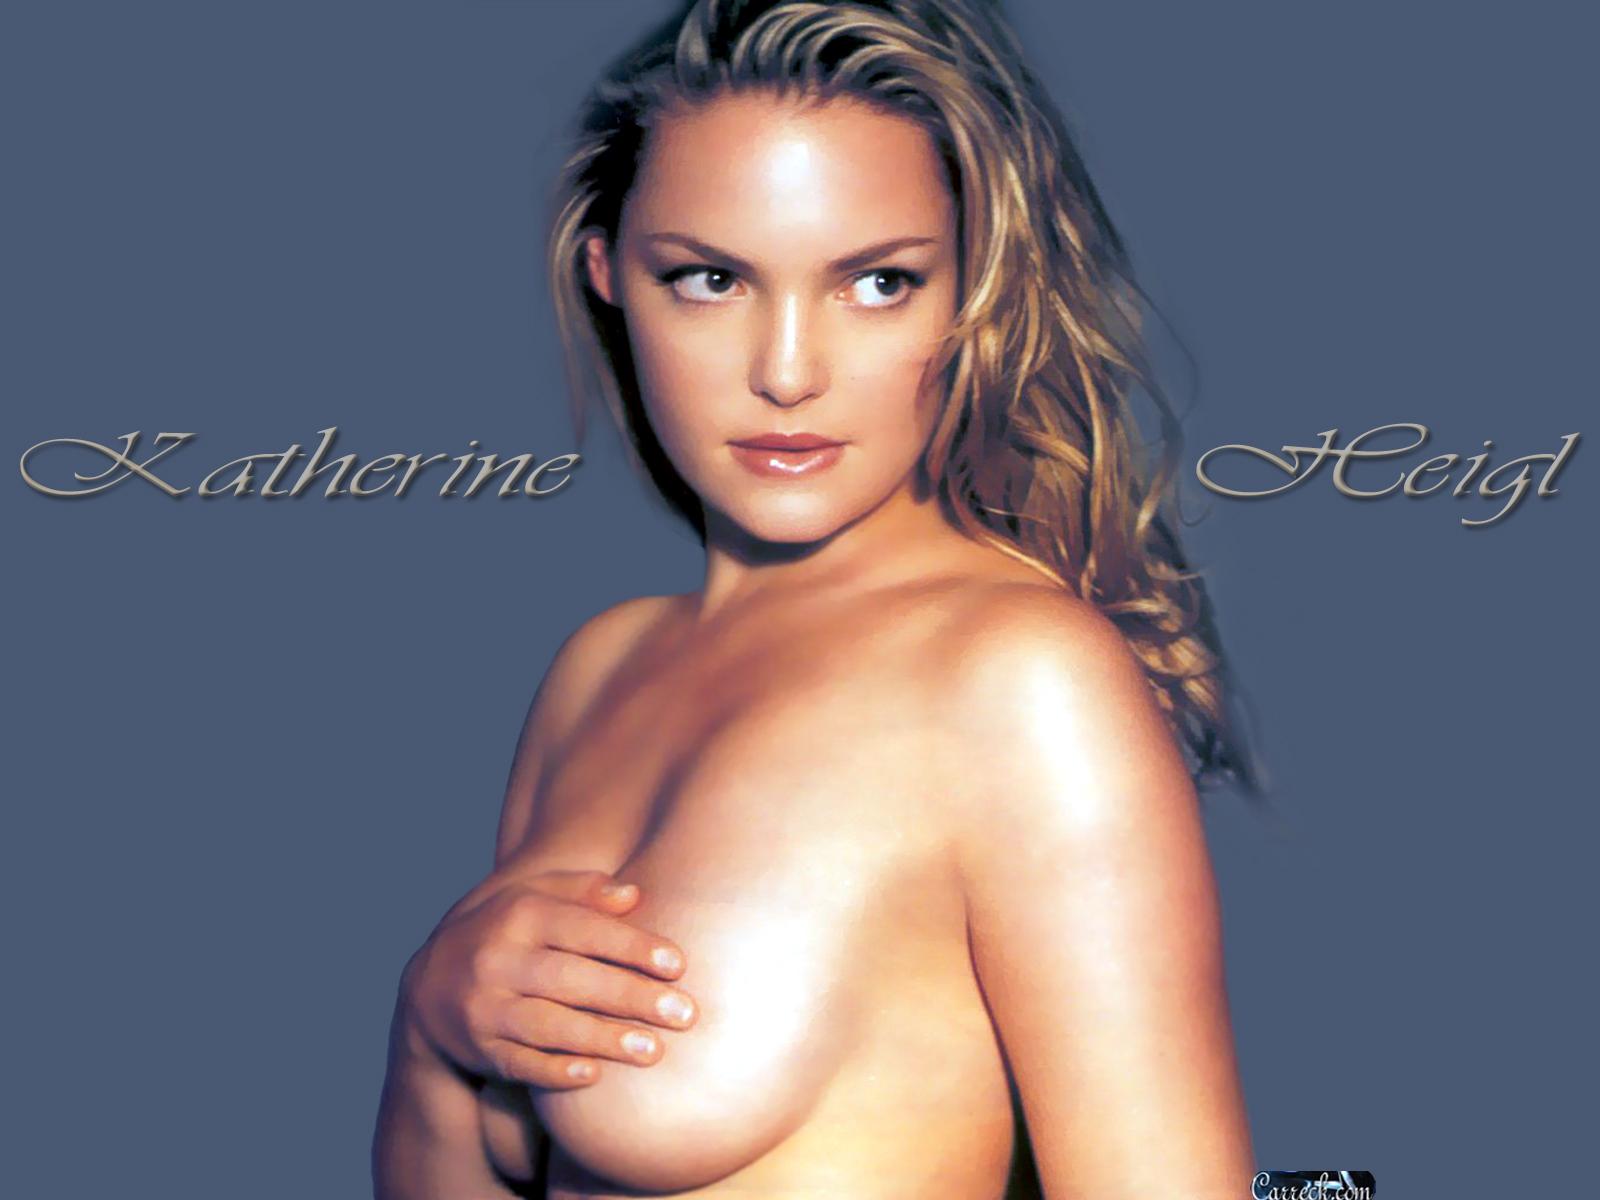 katherine heigl naked in movie